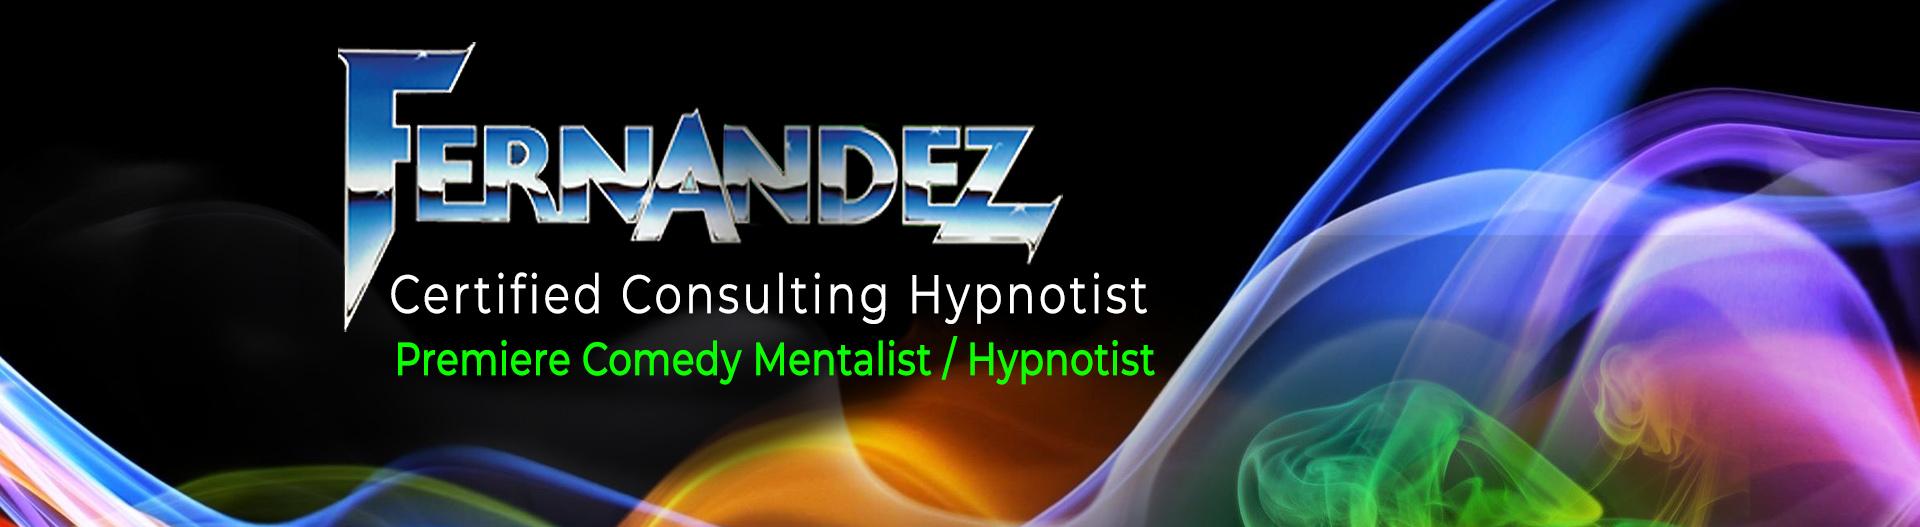 fernandez hypnotist and mentalistntalist